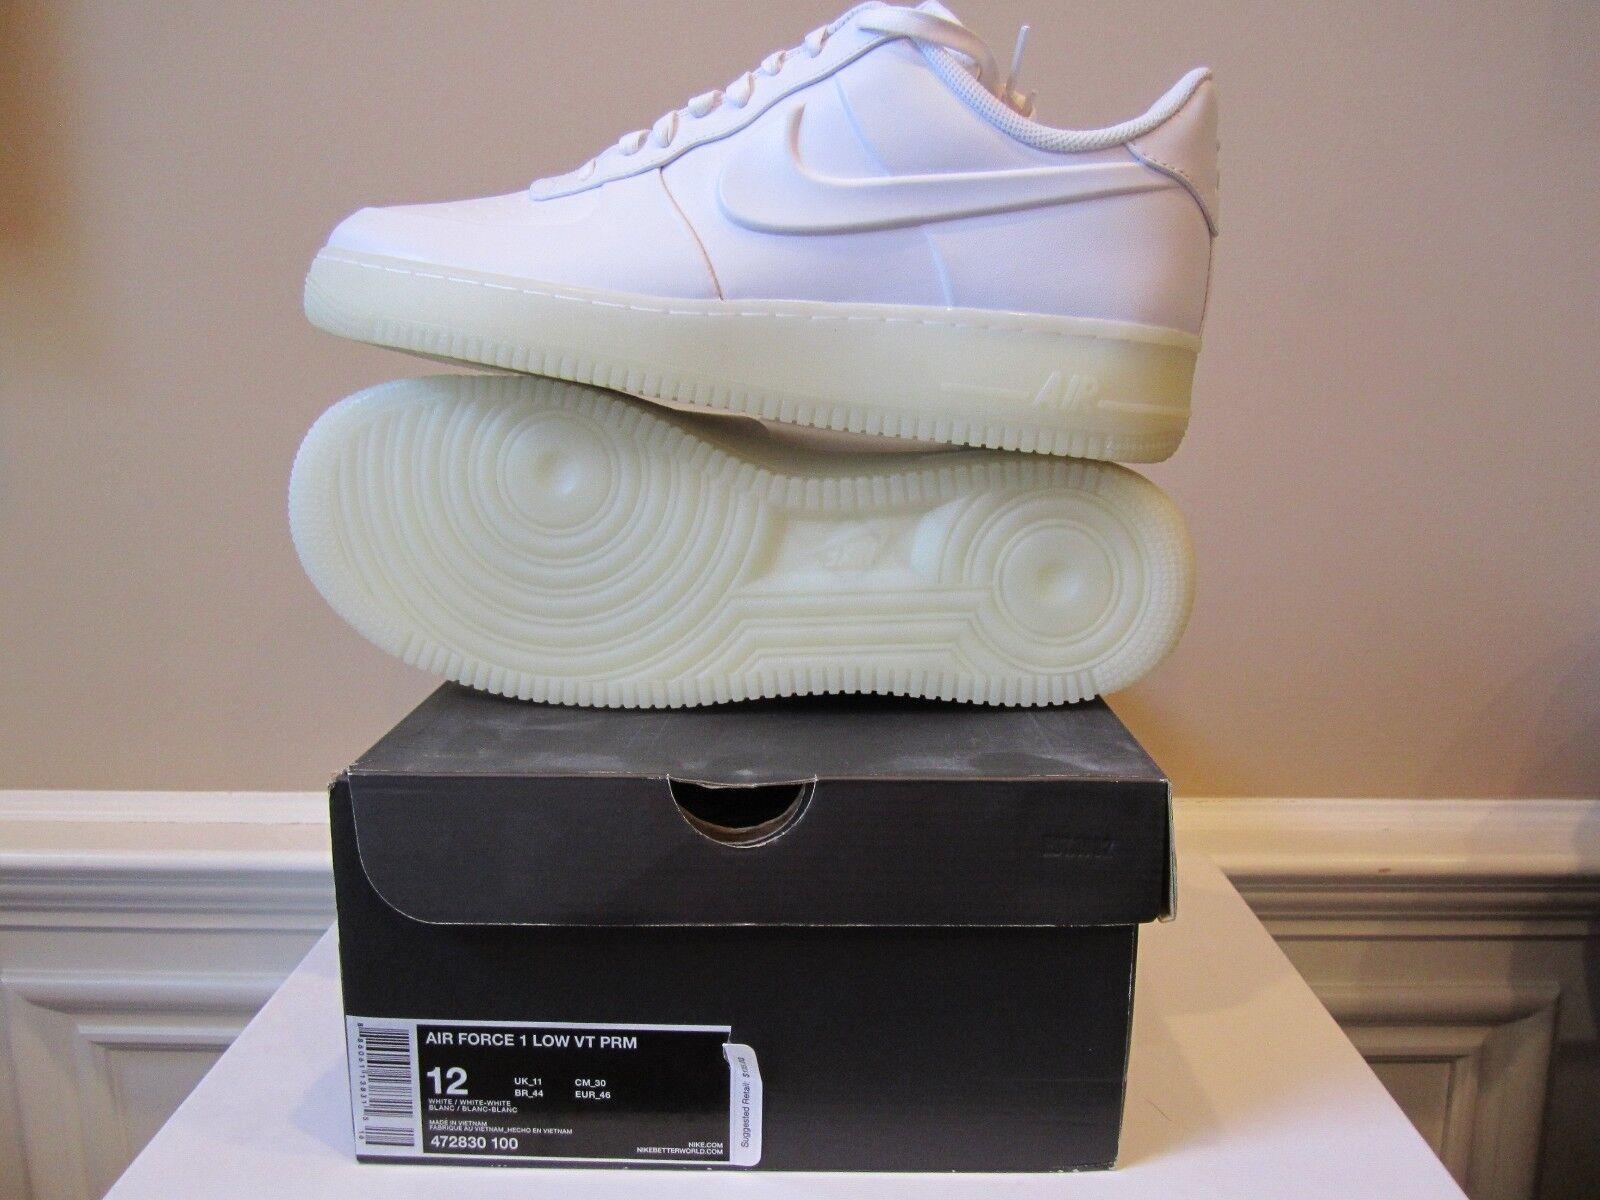 2018 Nike Air Force 1 baja VT prima Blanco VAC Tech Blanco prima Foamposite 472830-100 sz12 baratos zapatos de mujer zapatos de mujer 47c78e